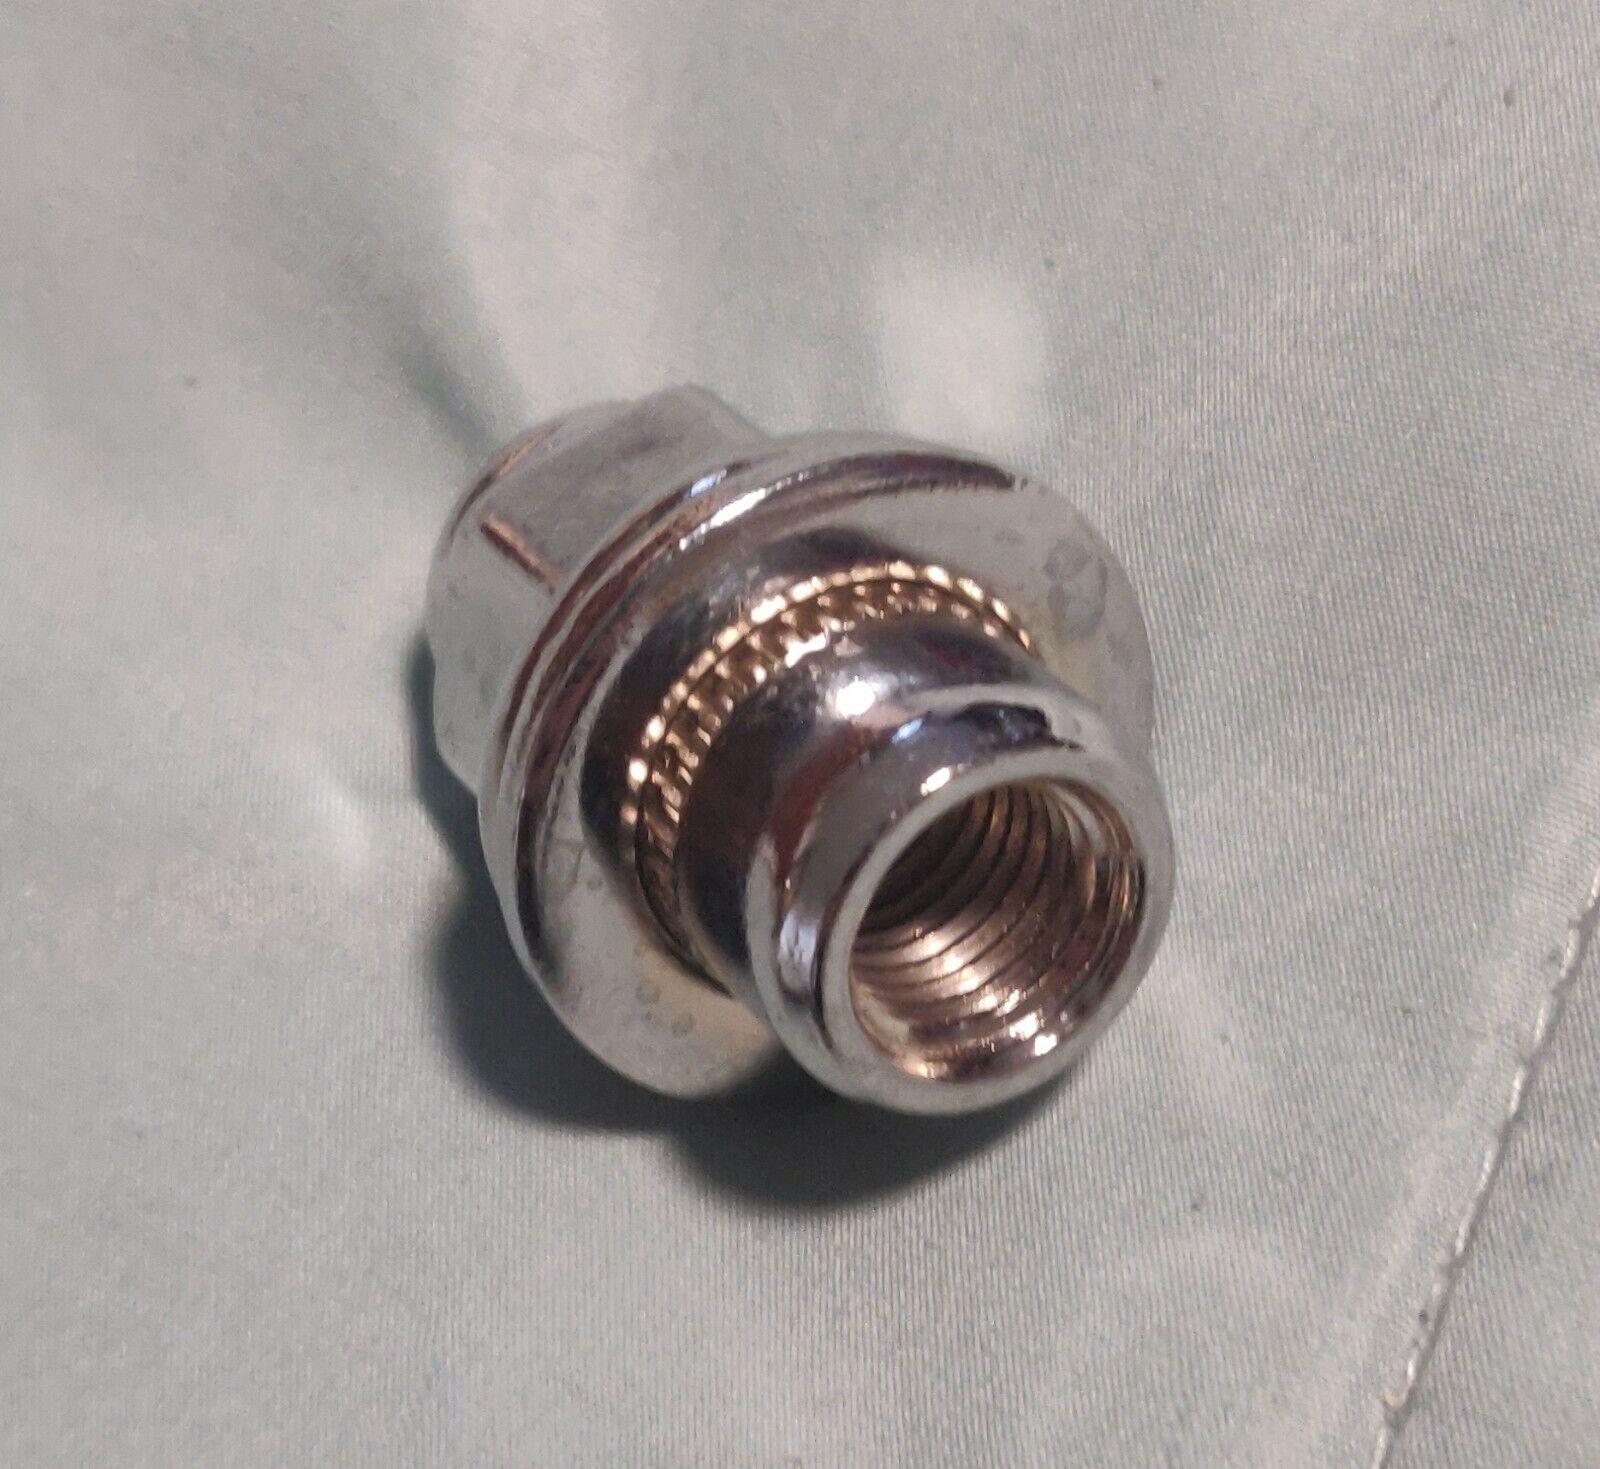 OEM Dorman Lug Nuts For Toyota Lexus # 90942-01033 611-117 Free Ship Set of 5